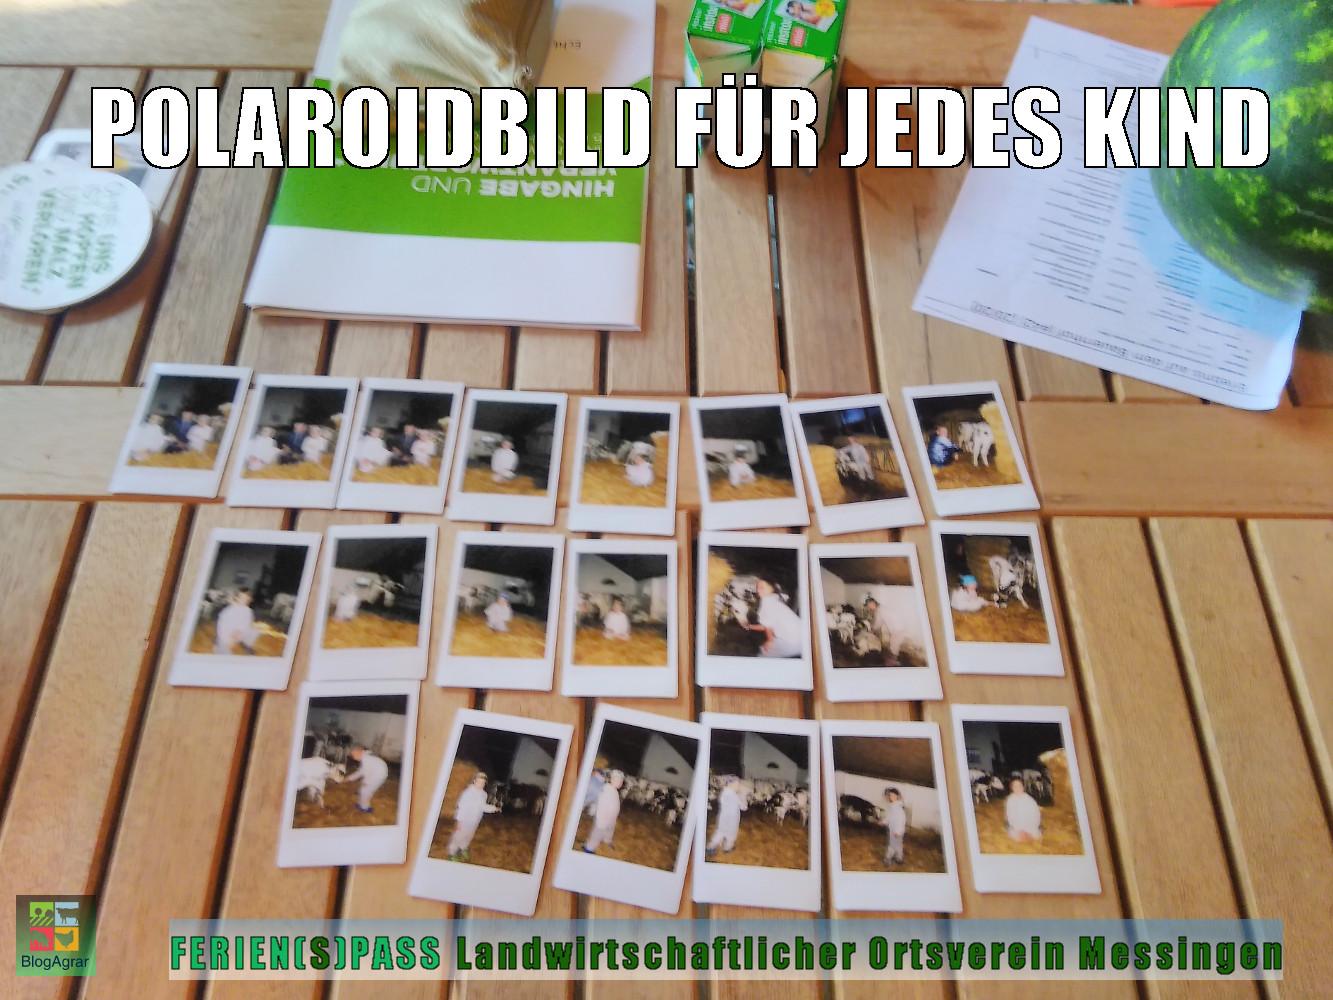 Polaroidbild für jedes Kind